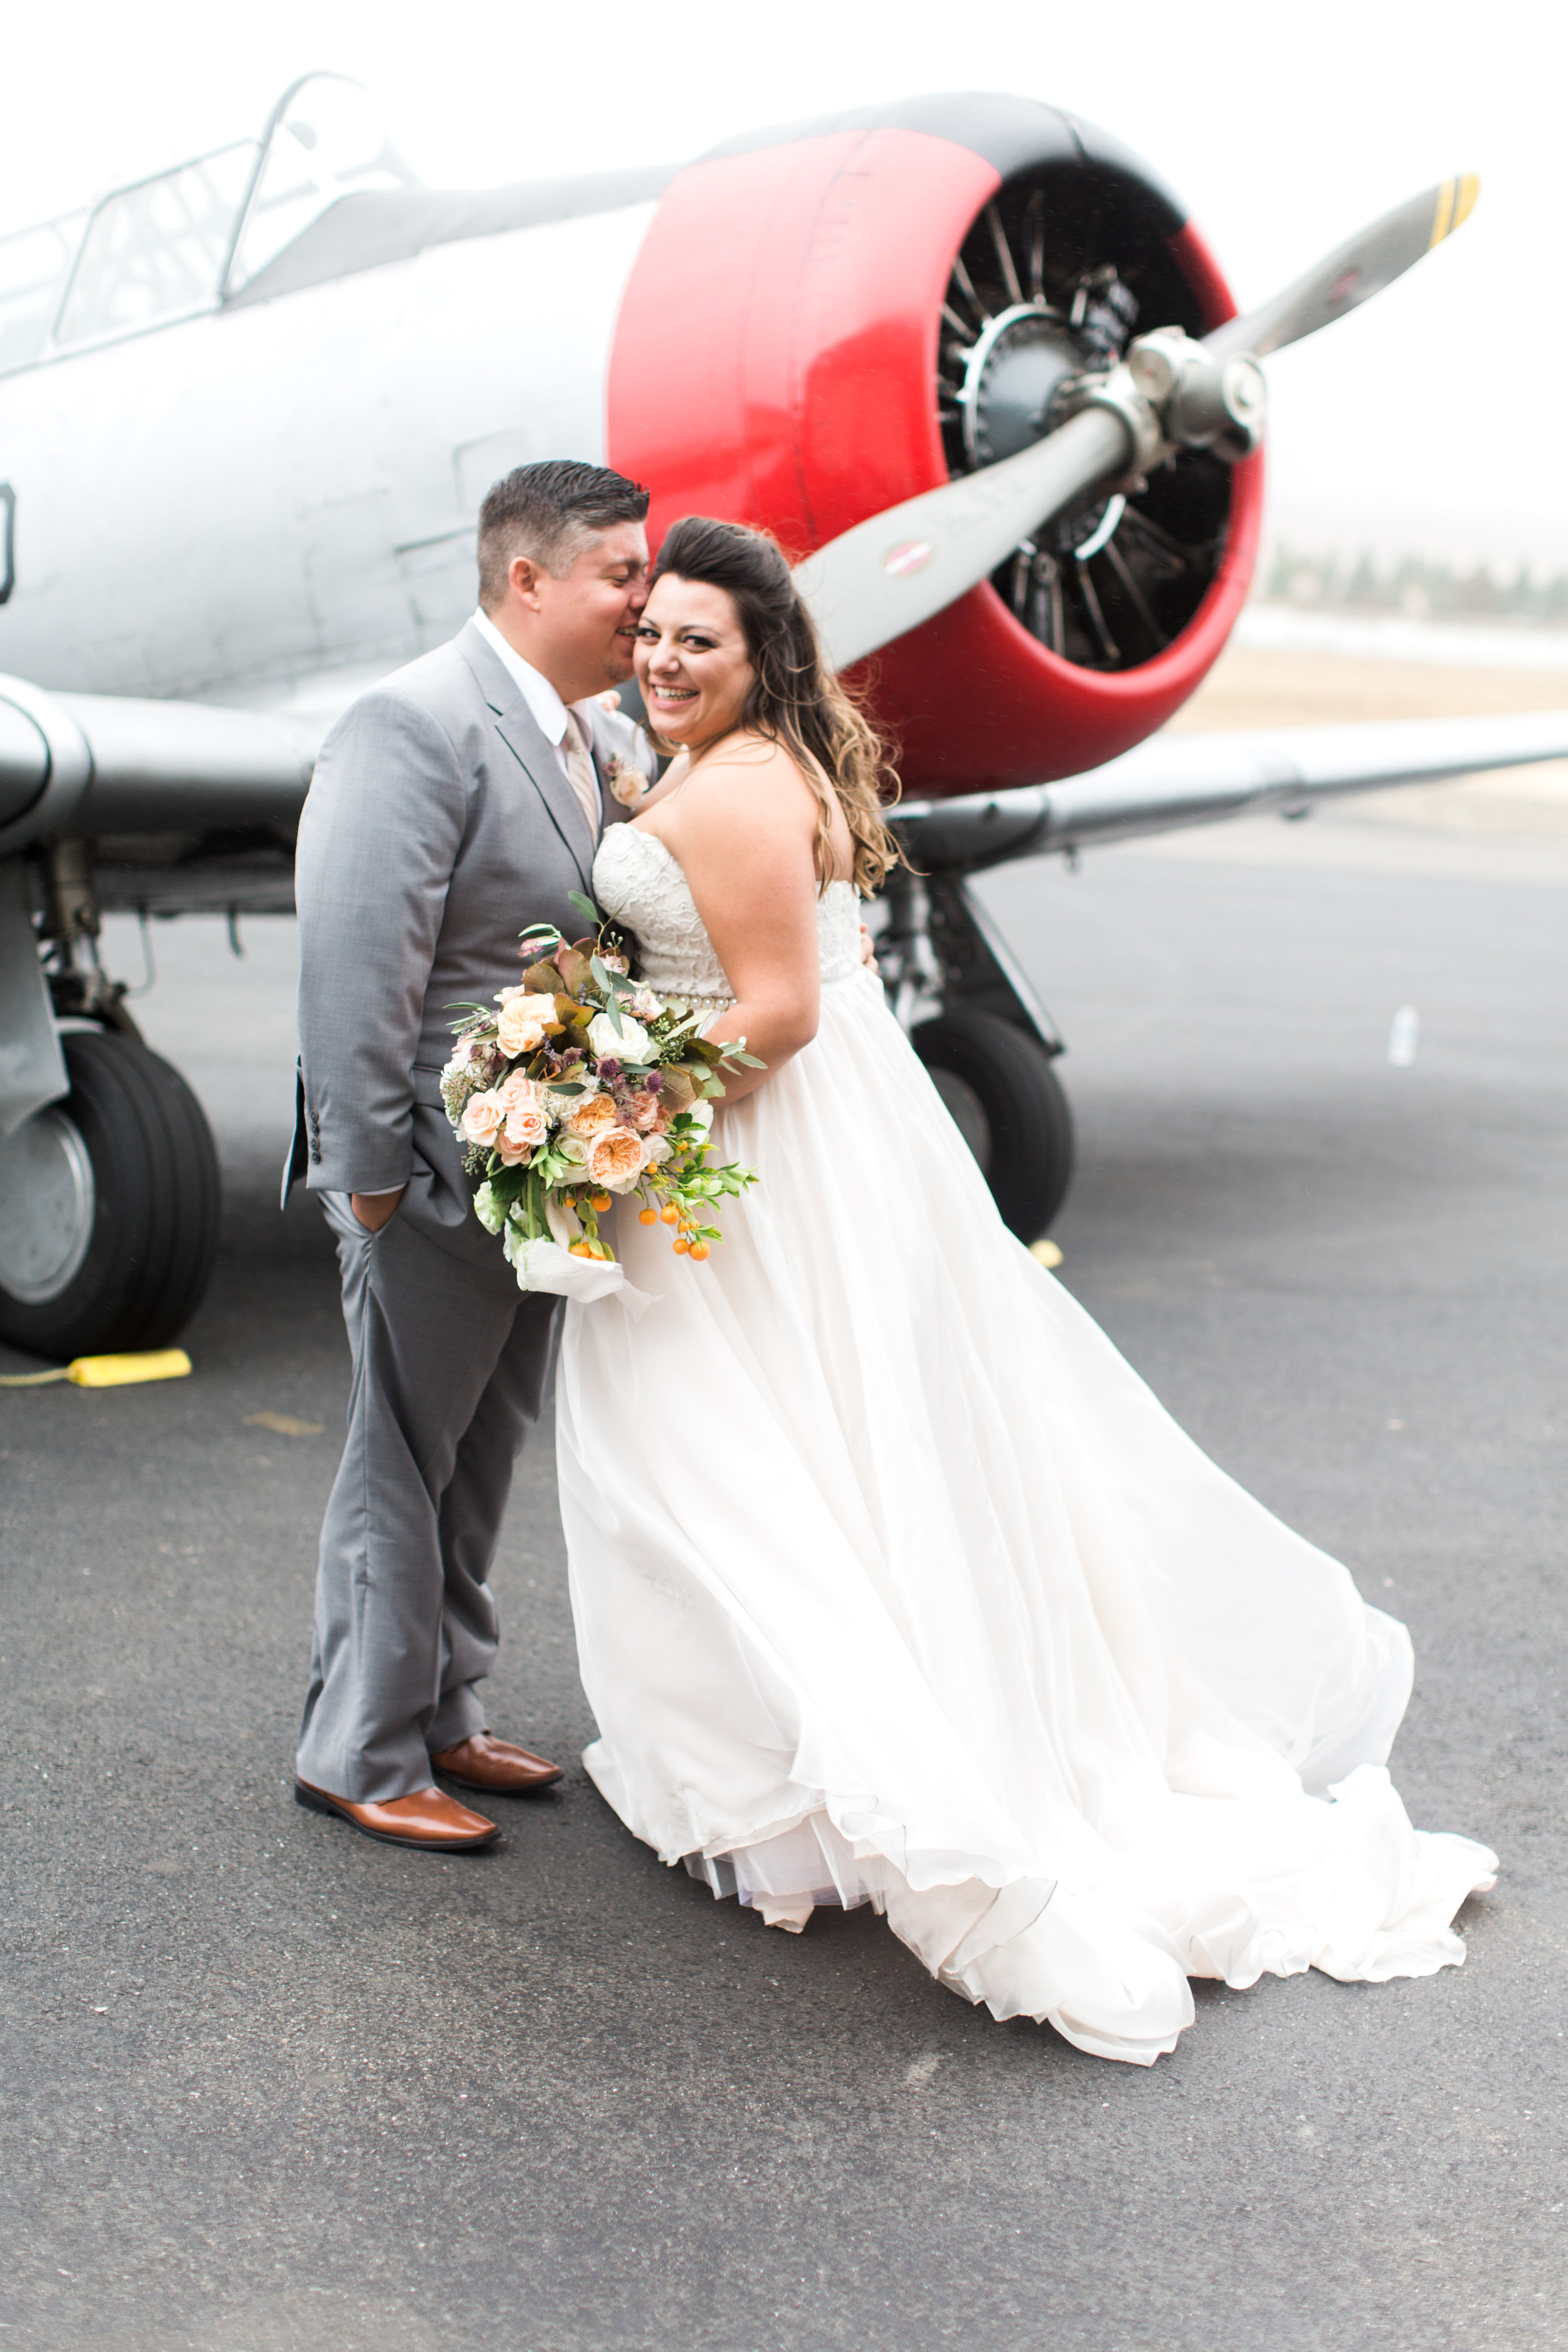 airport-hanger-wedding-at-attitude-aviation-in-livermore-77.jpg